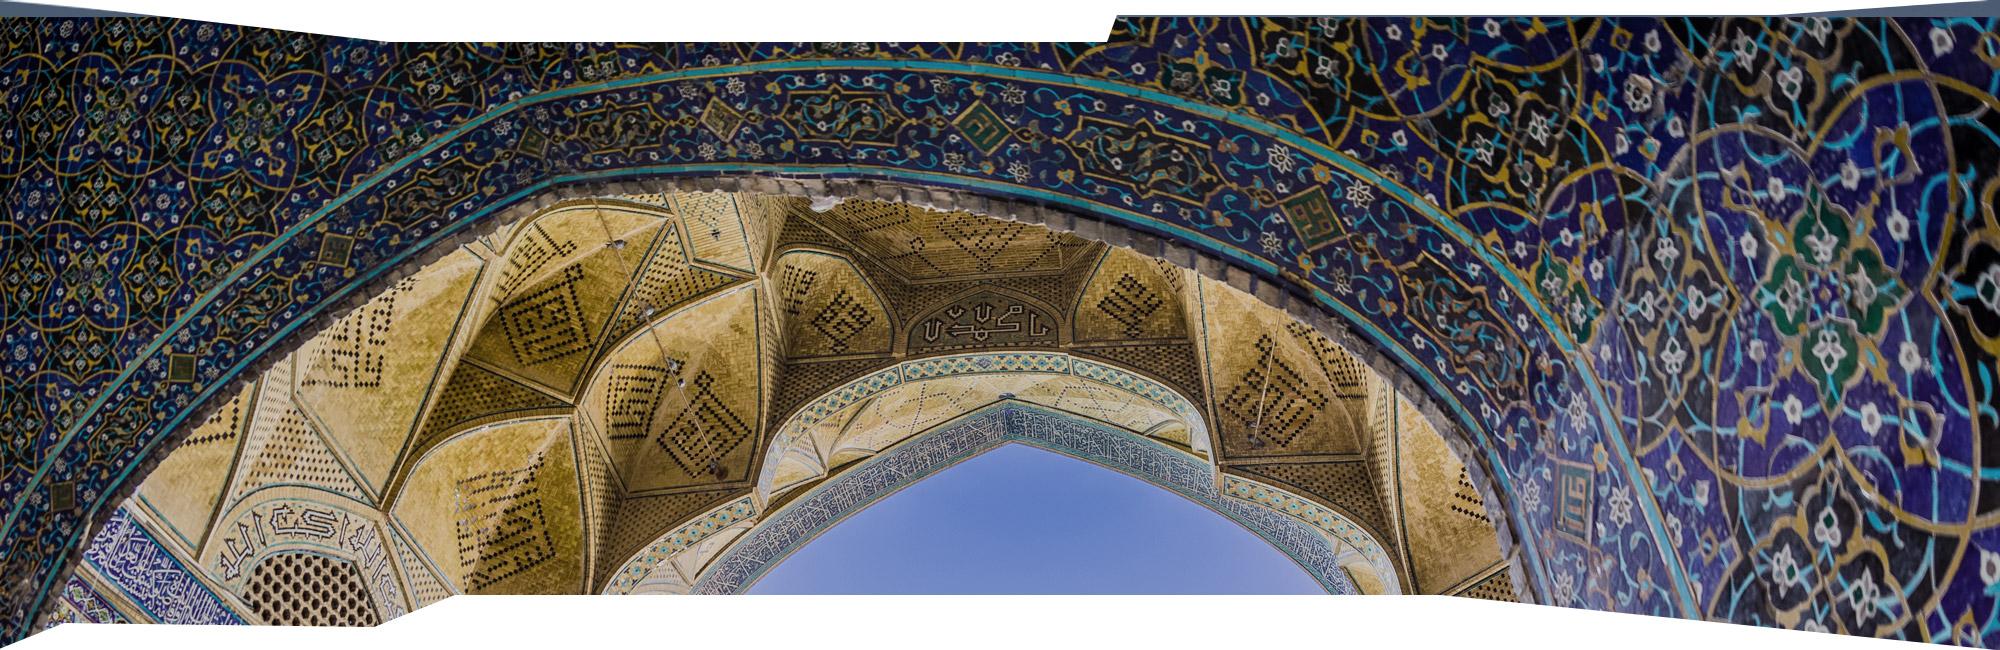 Mosaic Architecture in Amman, Jordan